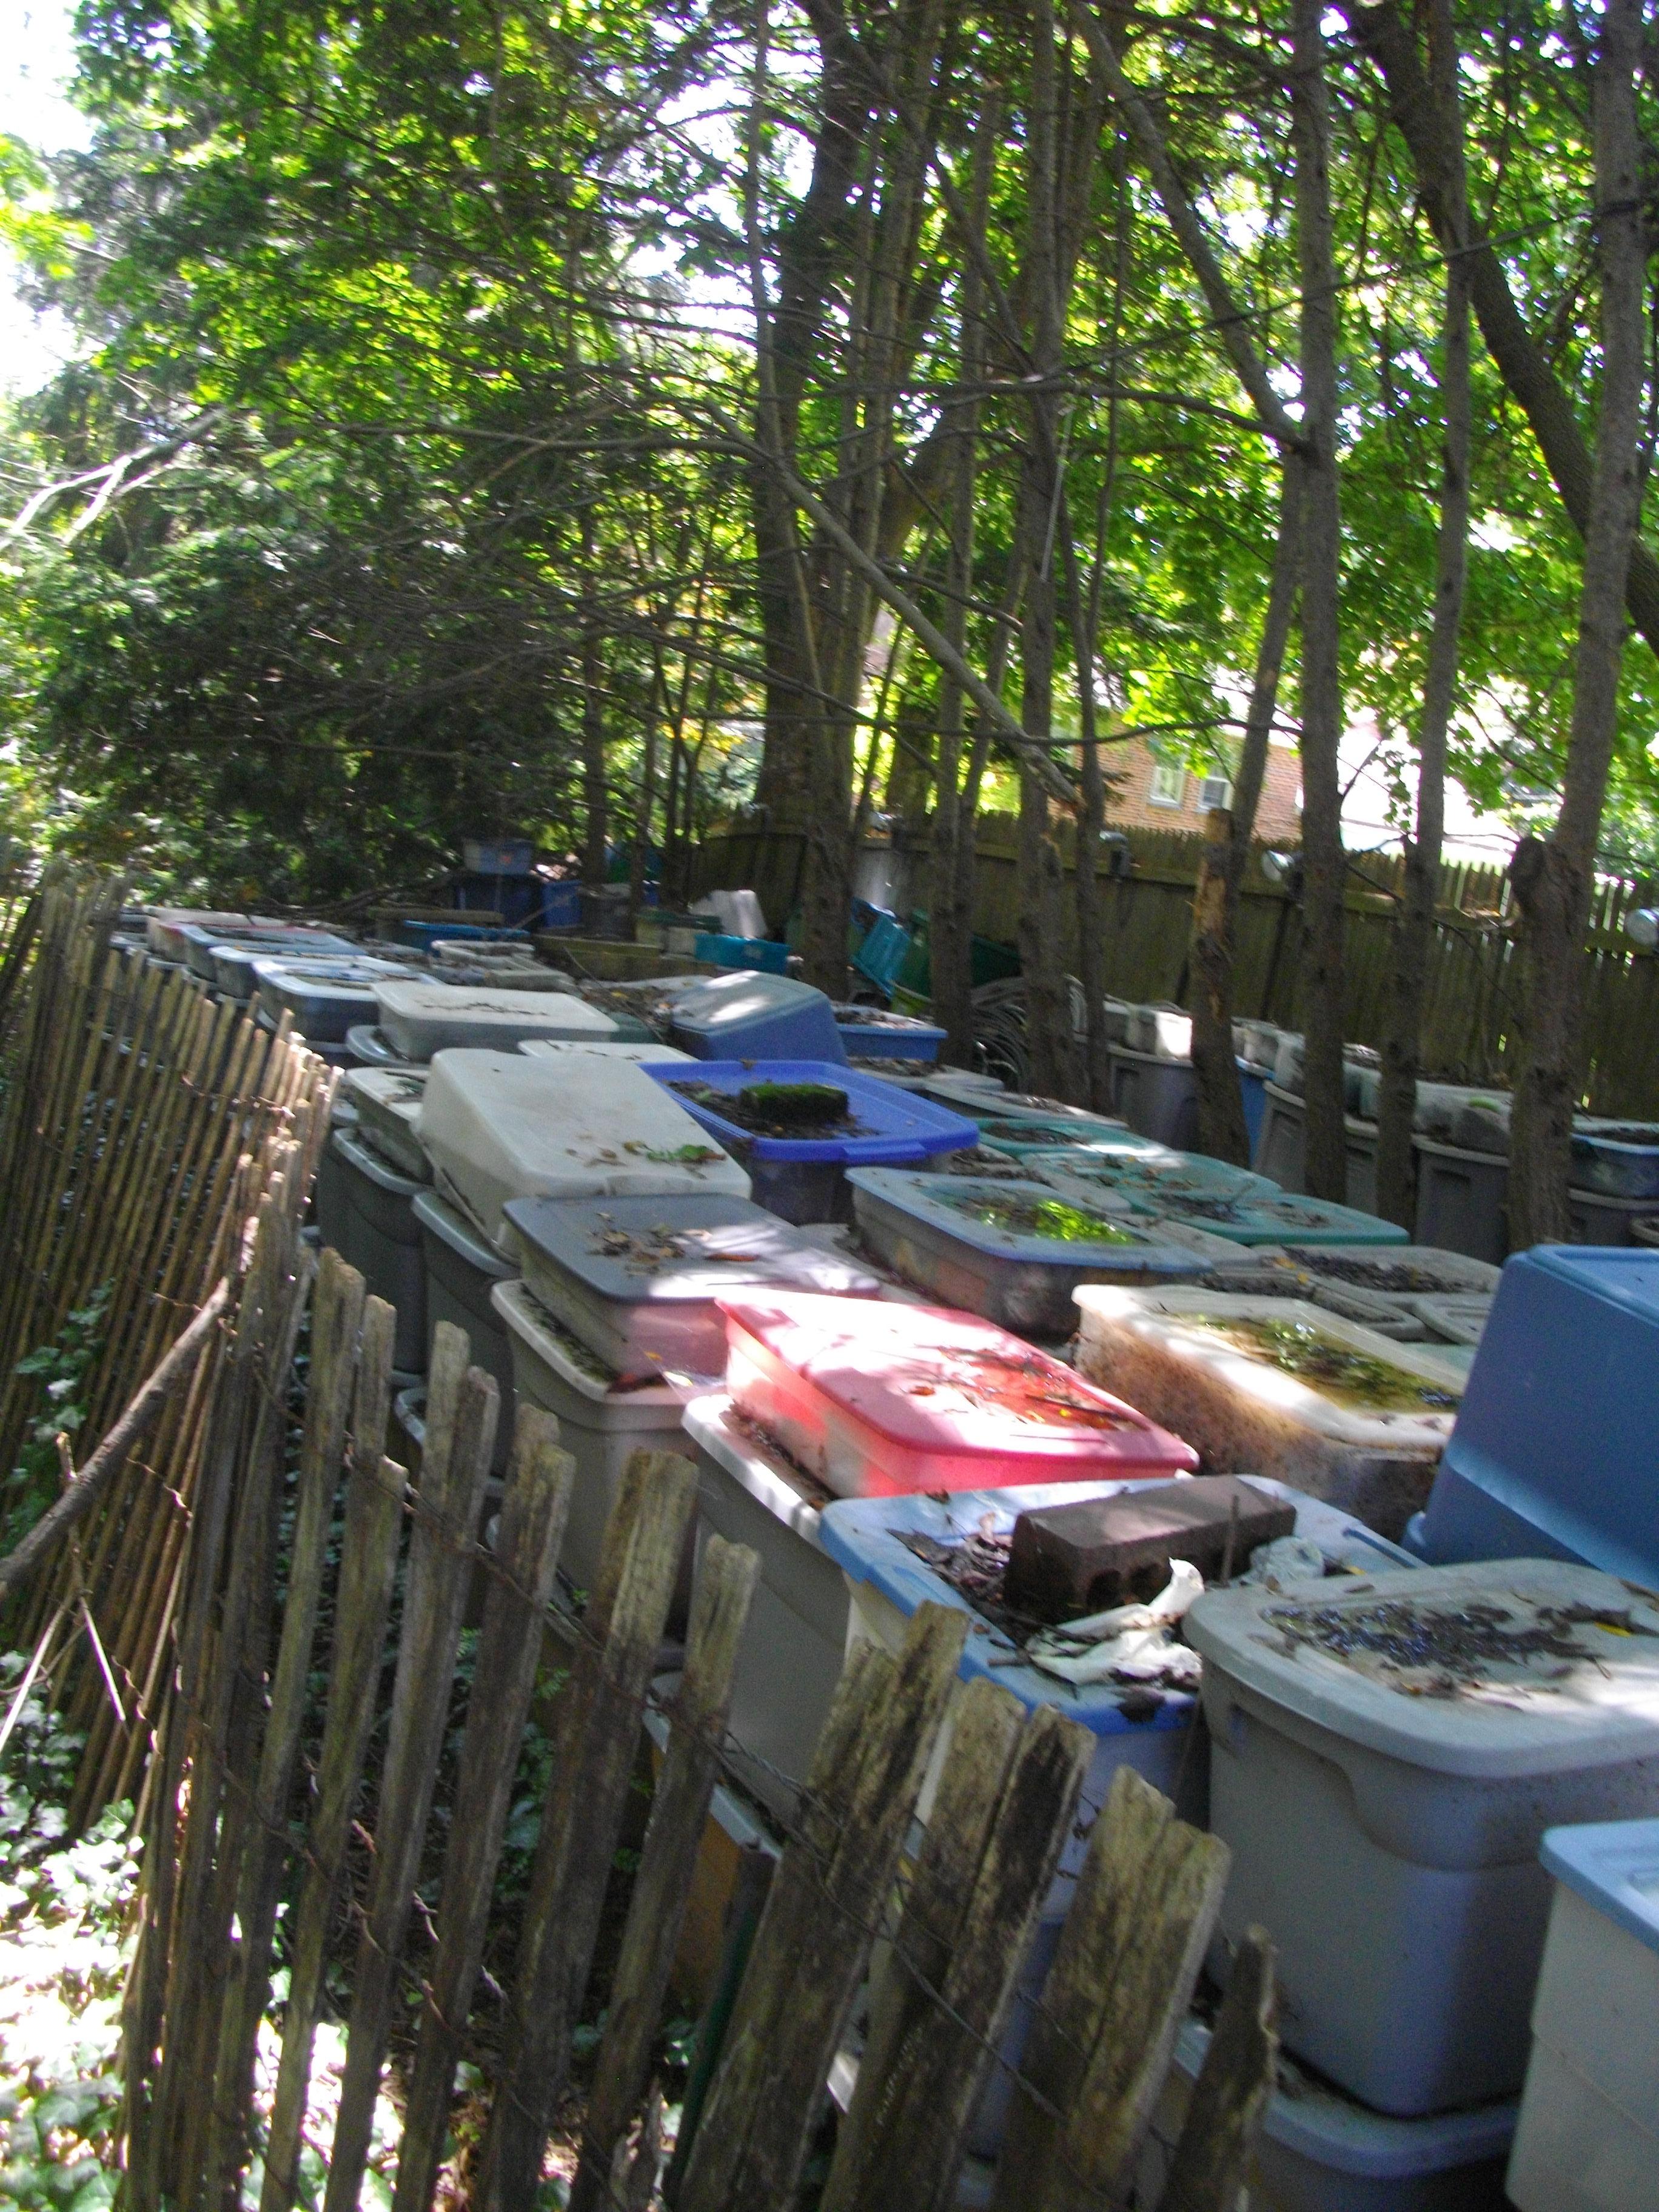 Backyard Bins discovering 800 hoarded backyard bins | brick house 319